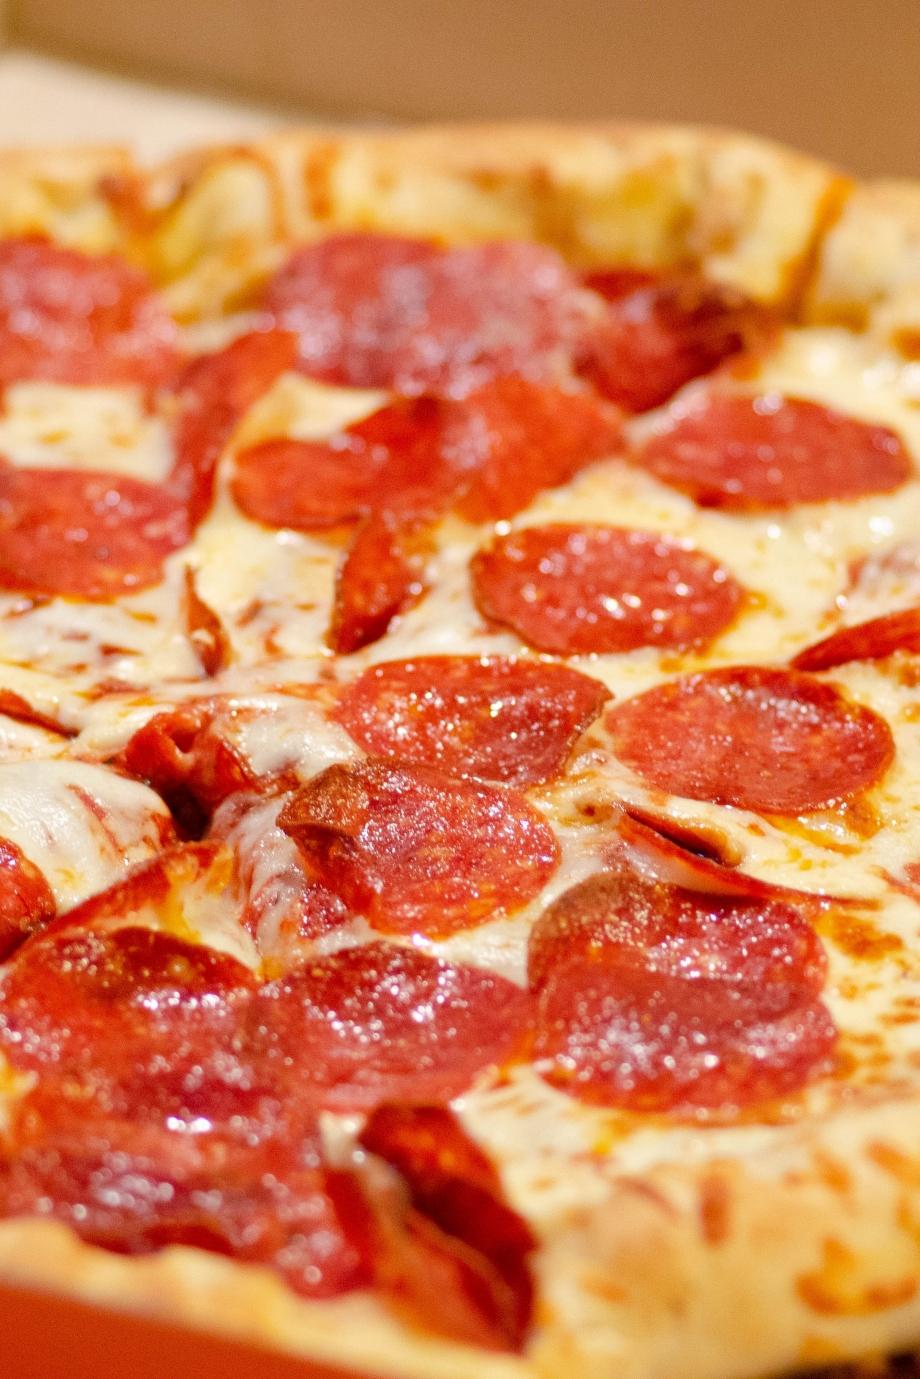 LisboaCool_Blog_A Domino's está a oferecer pizza!